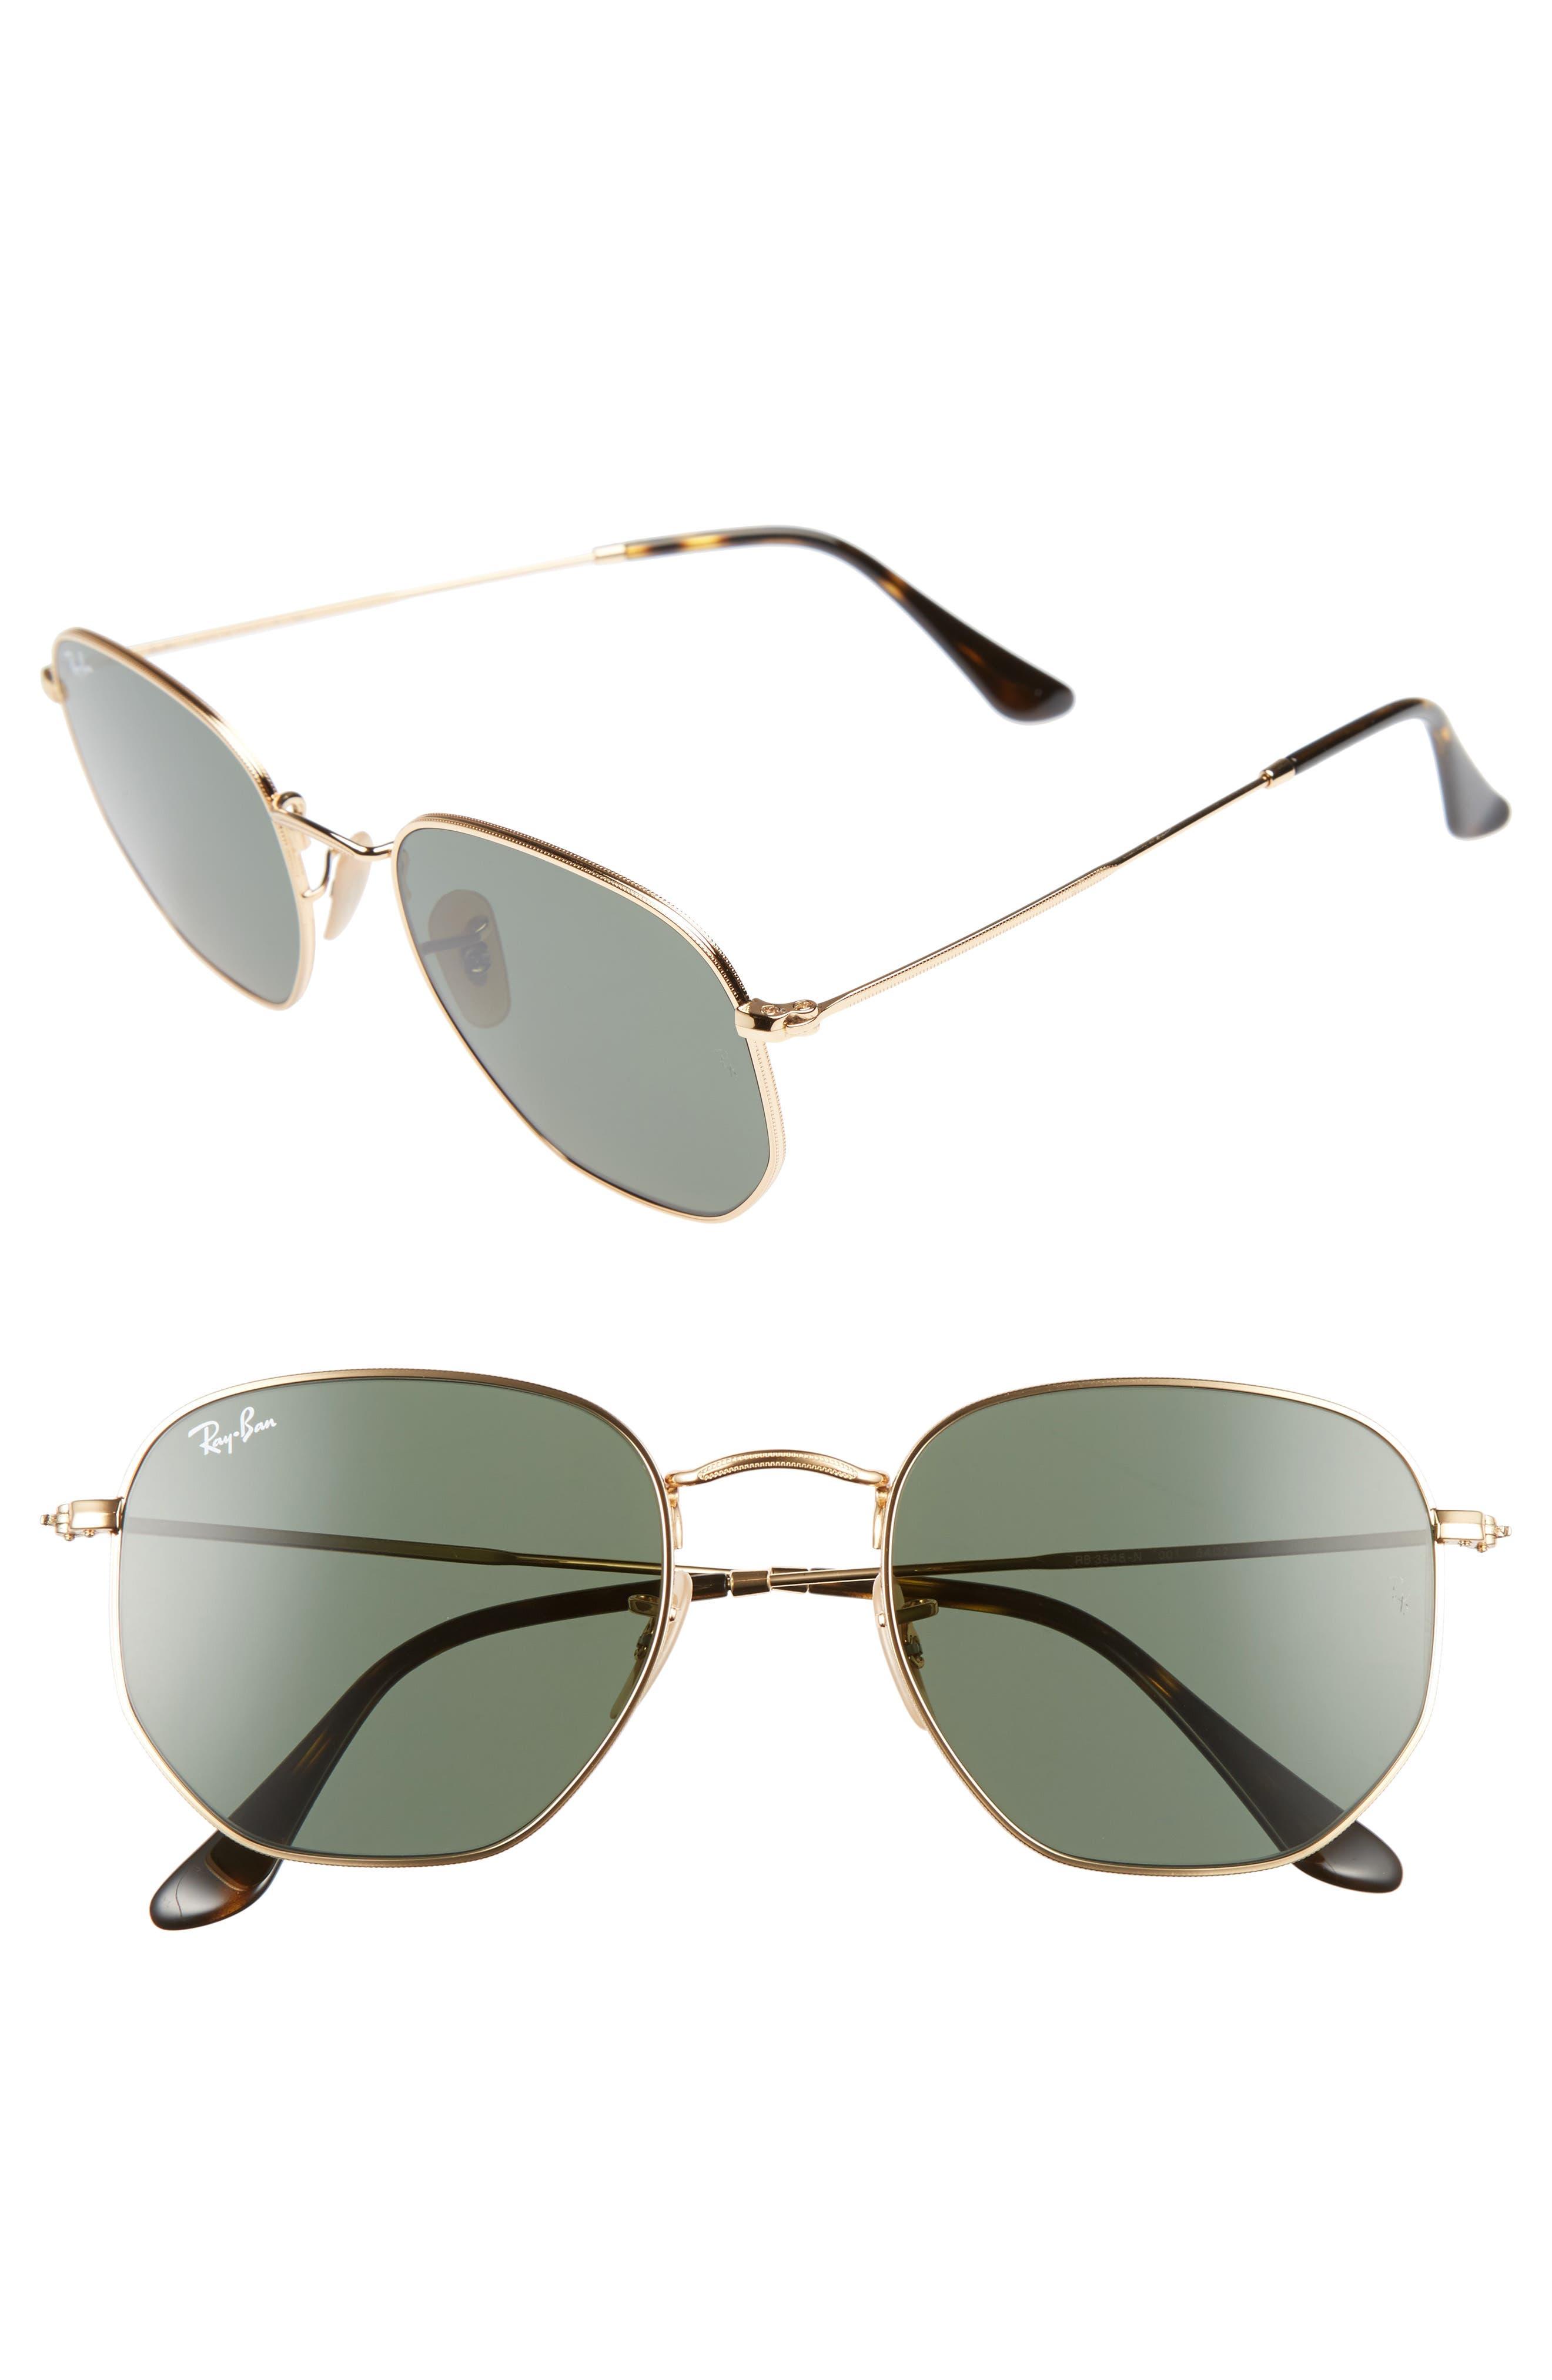 Ray-Ban 54mm Aviator Sunglasses - Gold/ Green